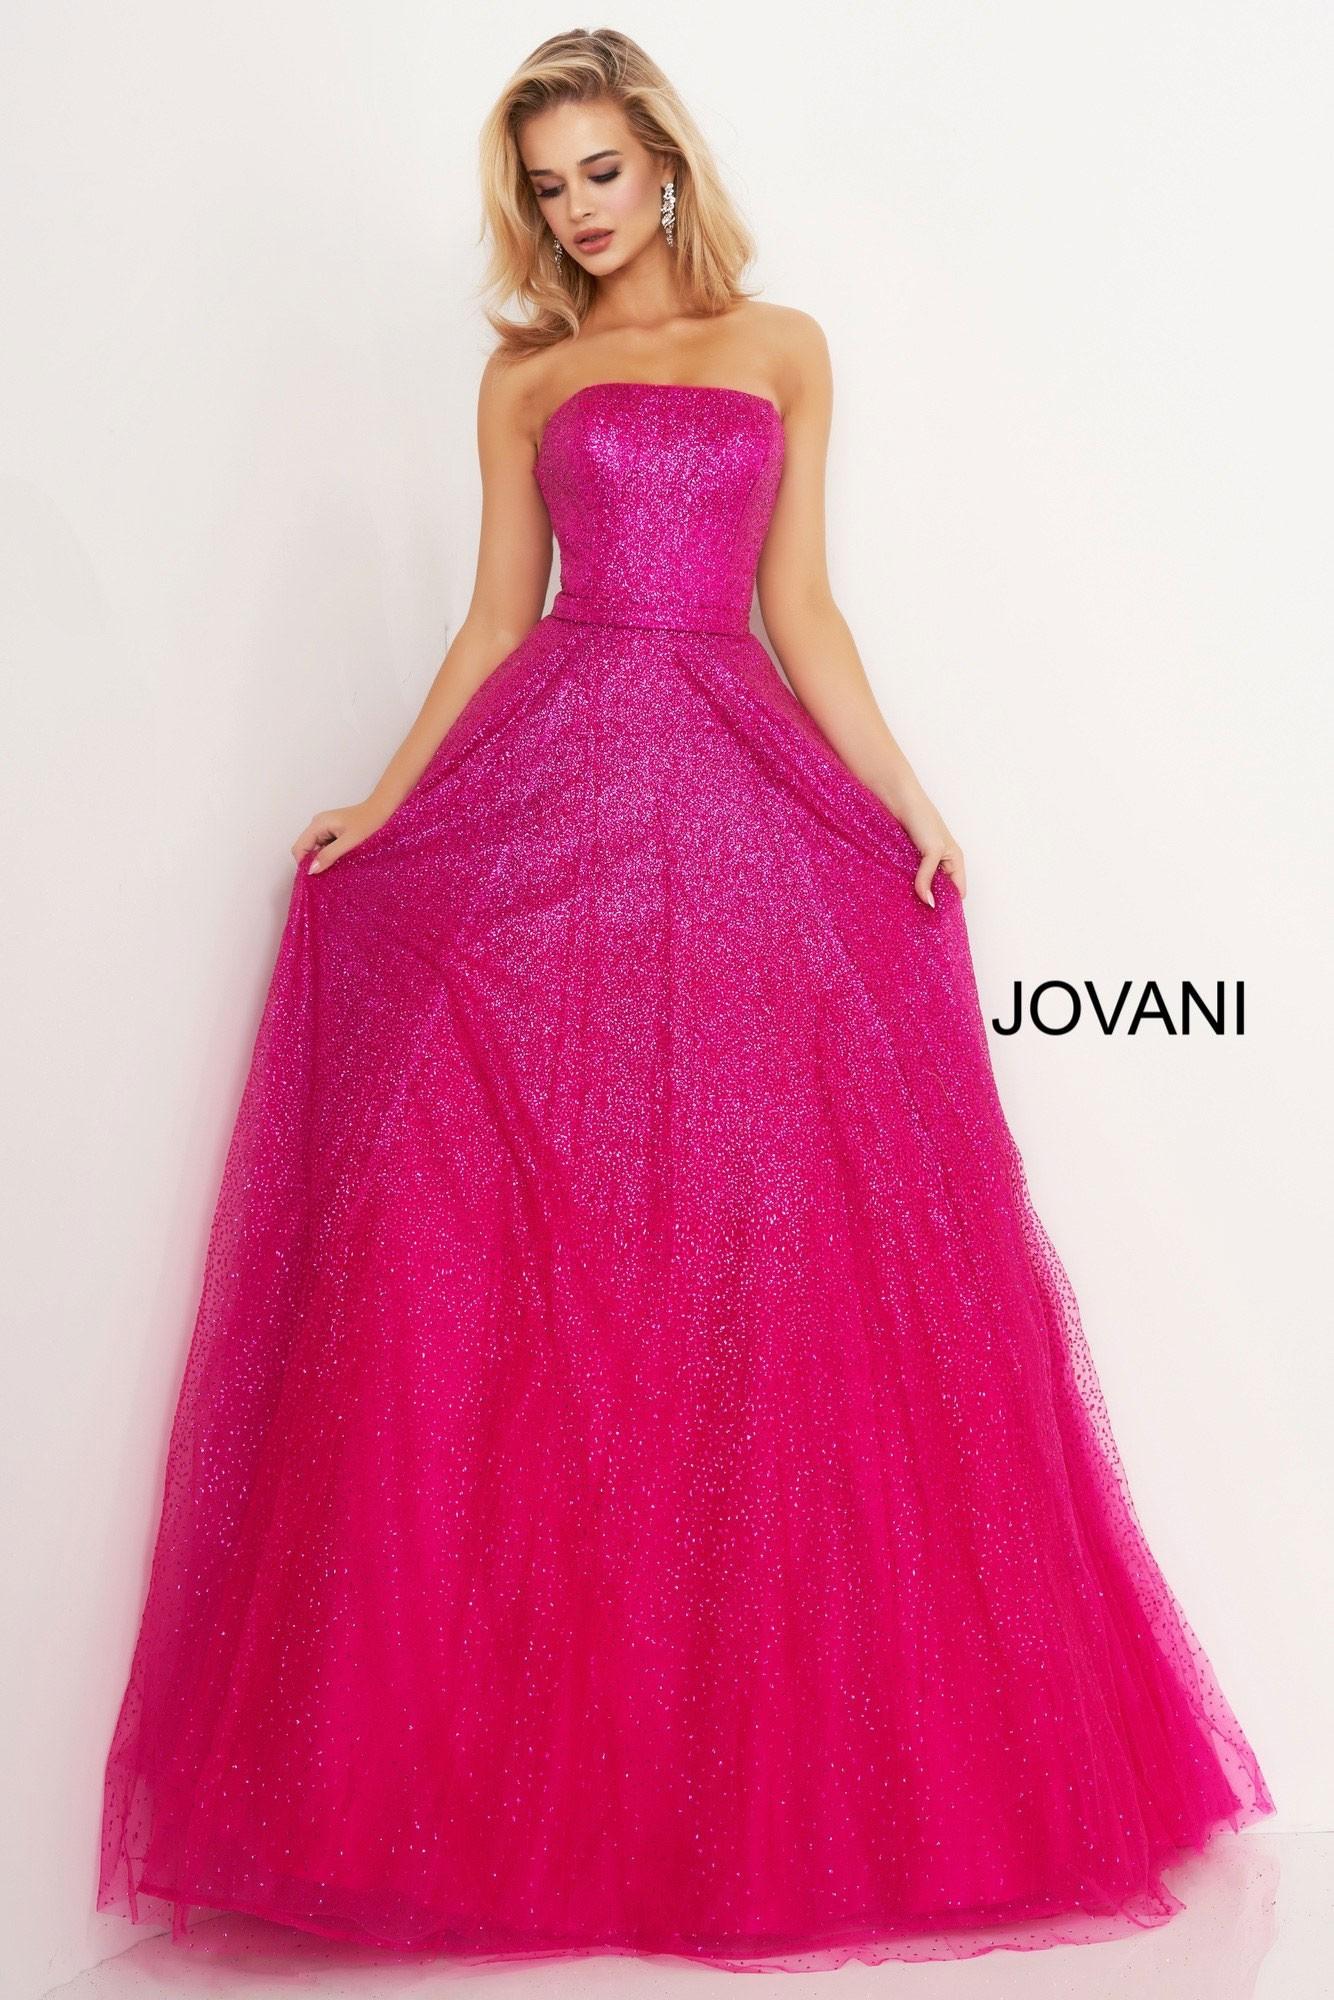 Jovani 02875